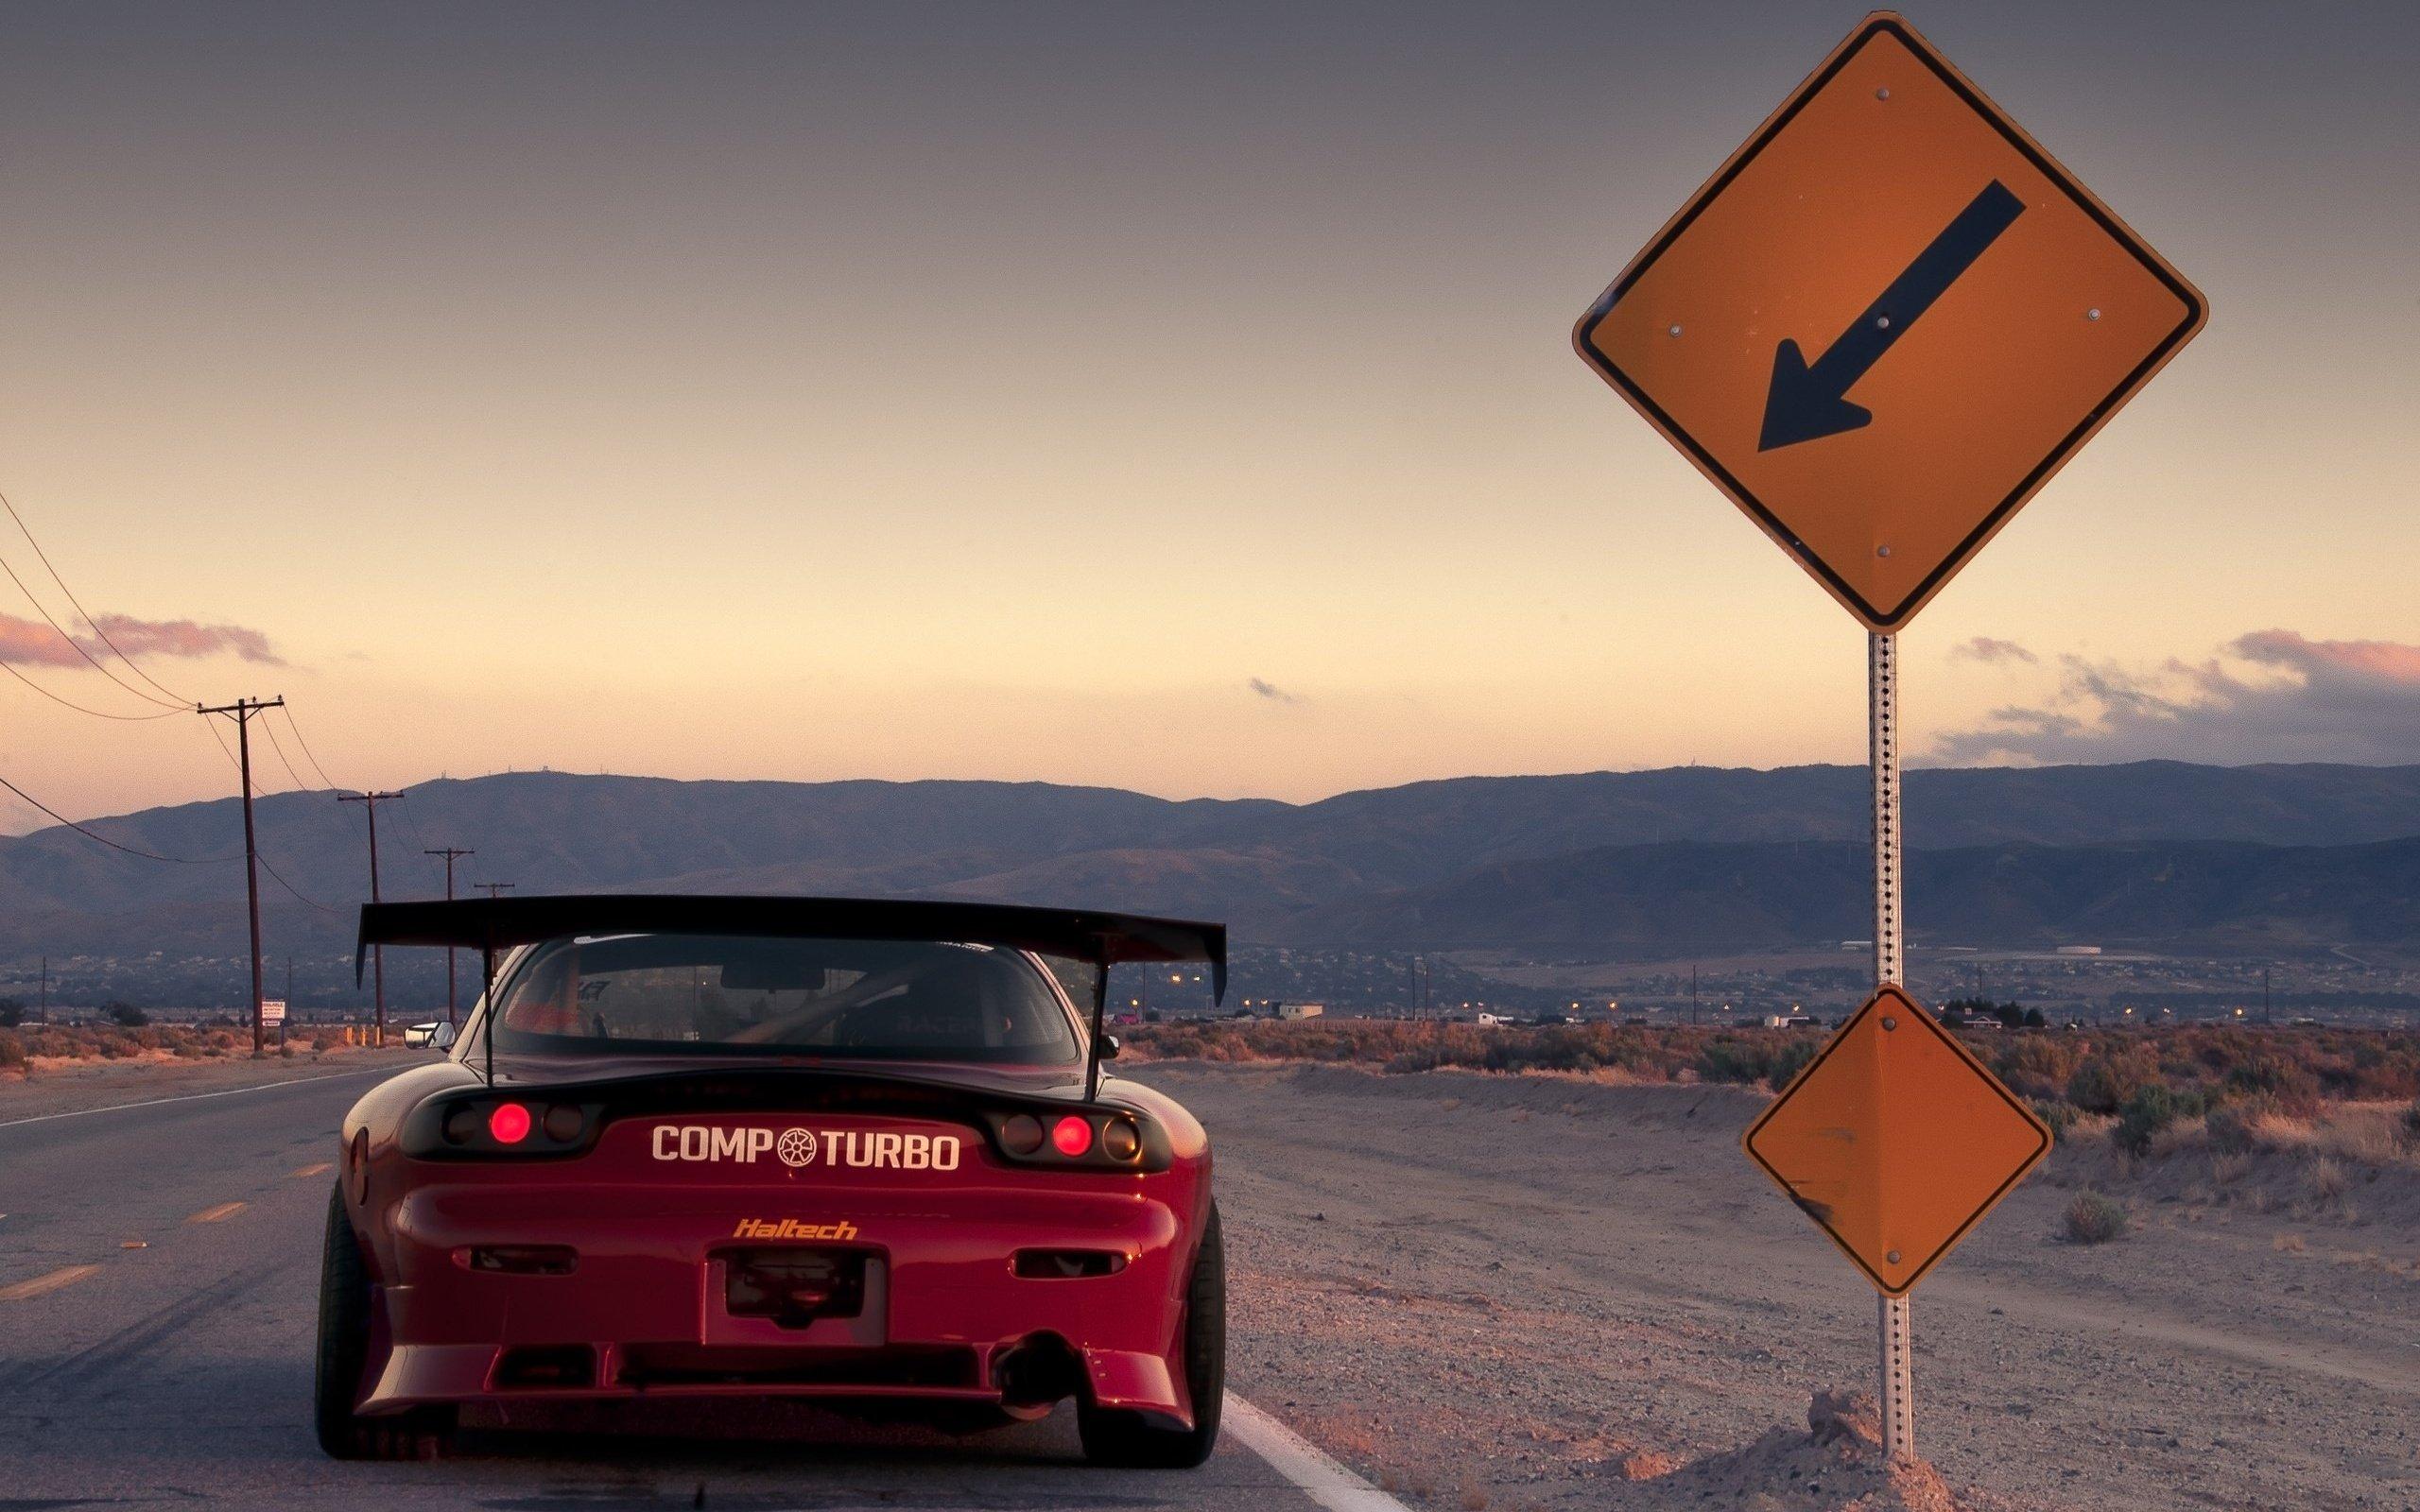 Jdm Car Wallpaper 1920x1080 Mazda Rx7 Wallpaper 2560x1600 421307 Wallpaperup